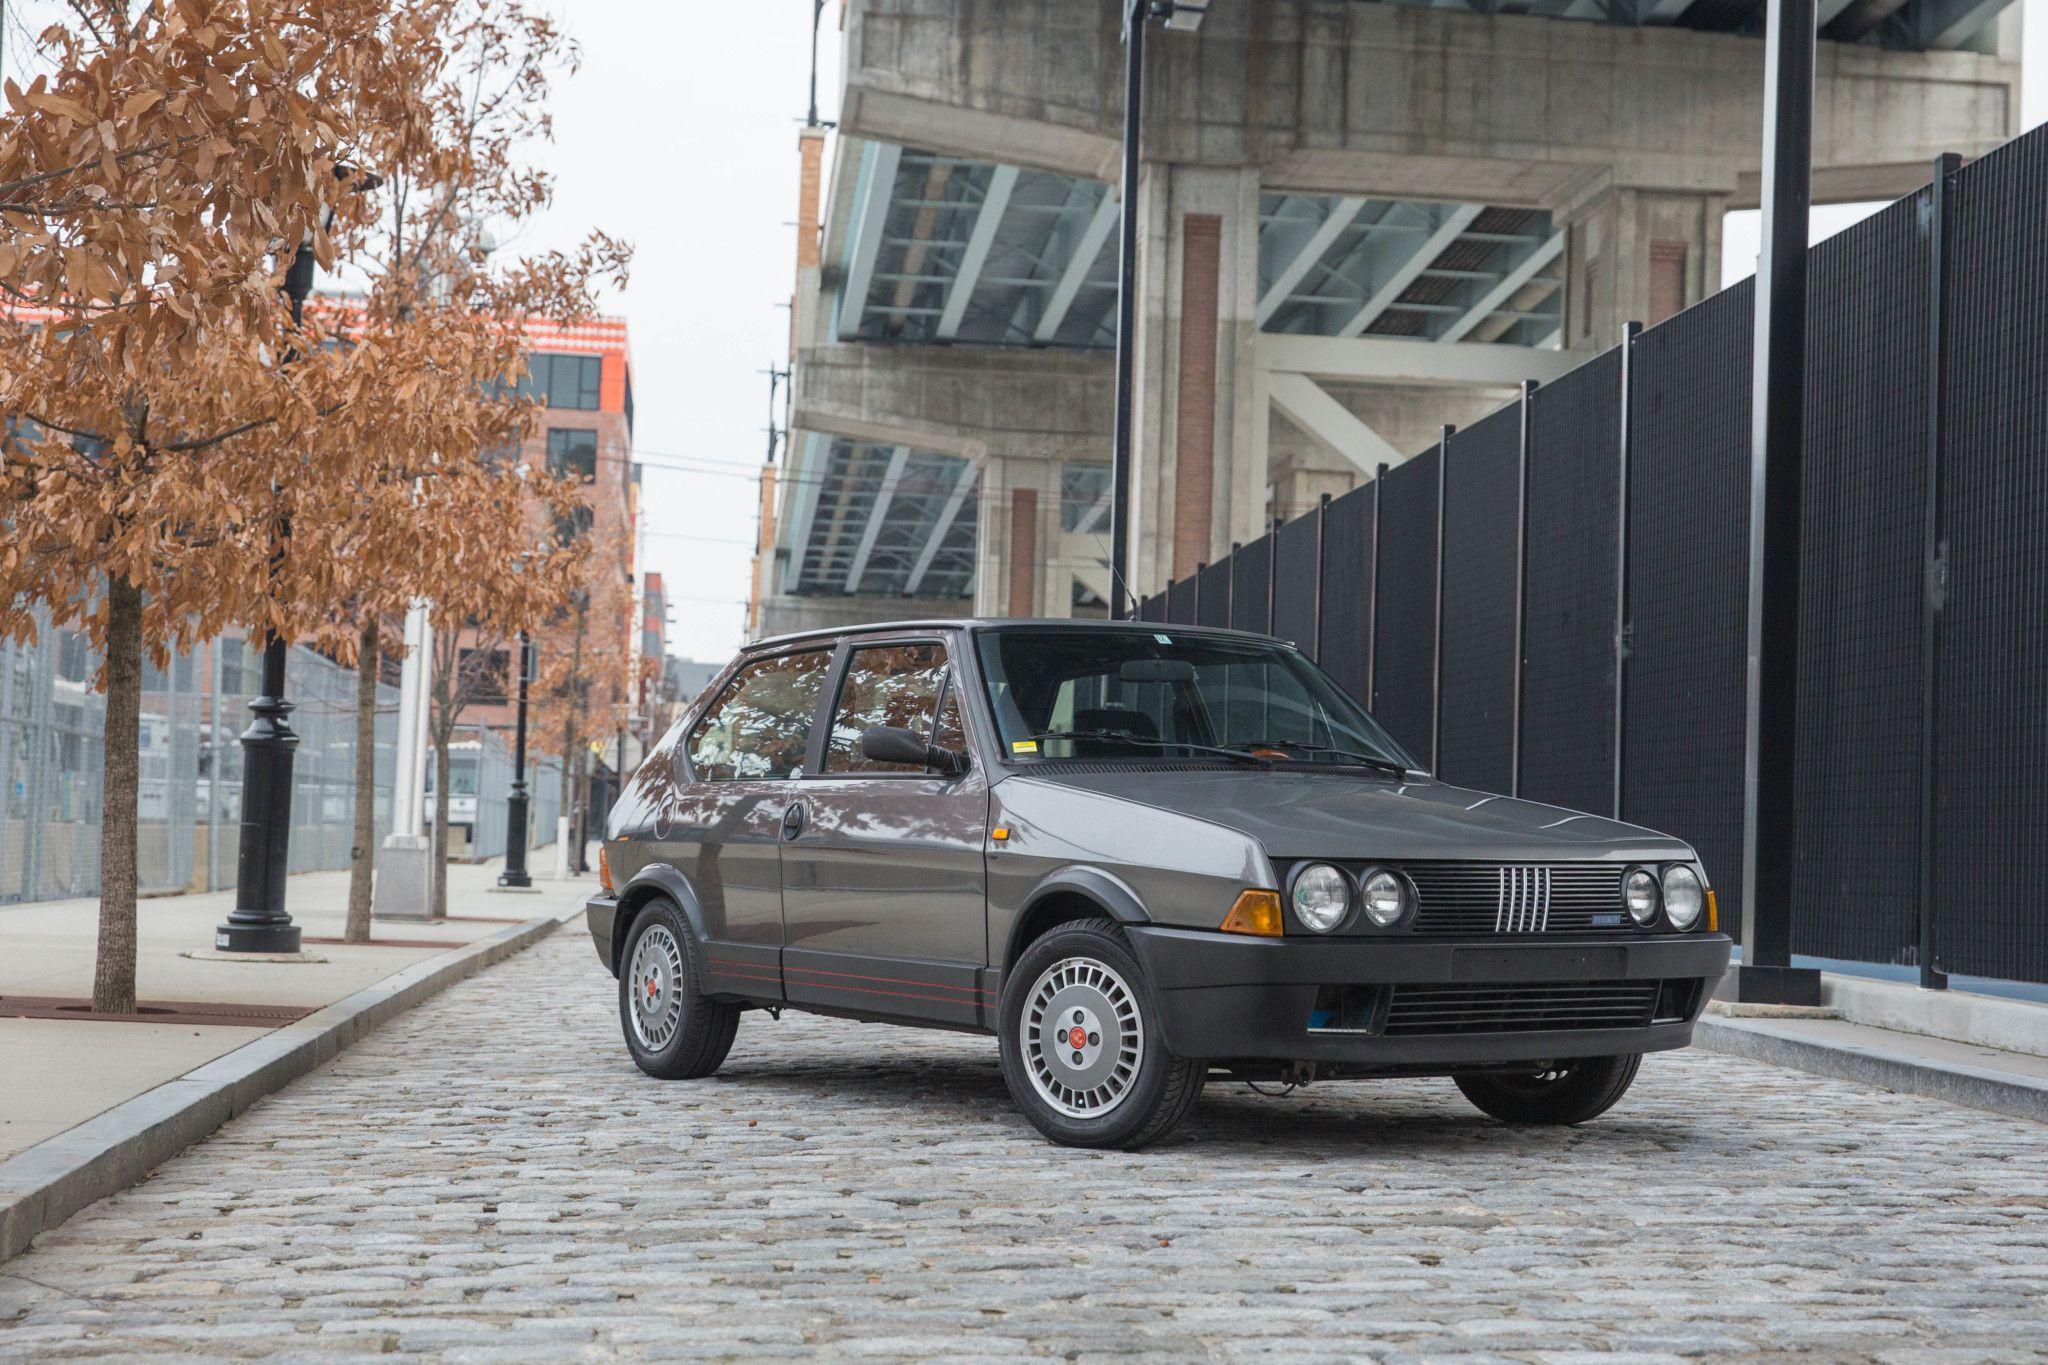 1987 fiat ritmo 130tc abarth fiat classic cars classic